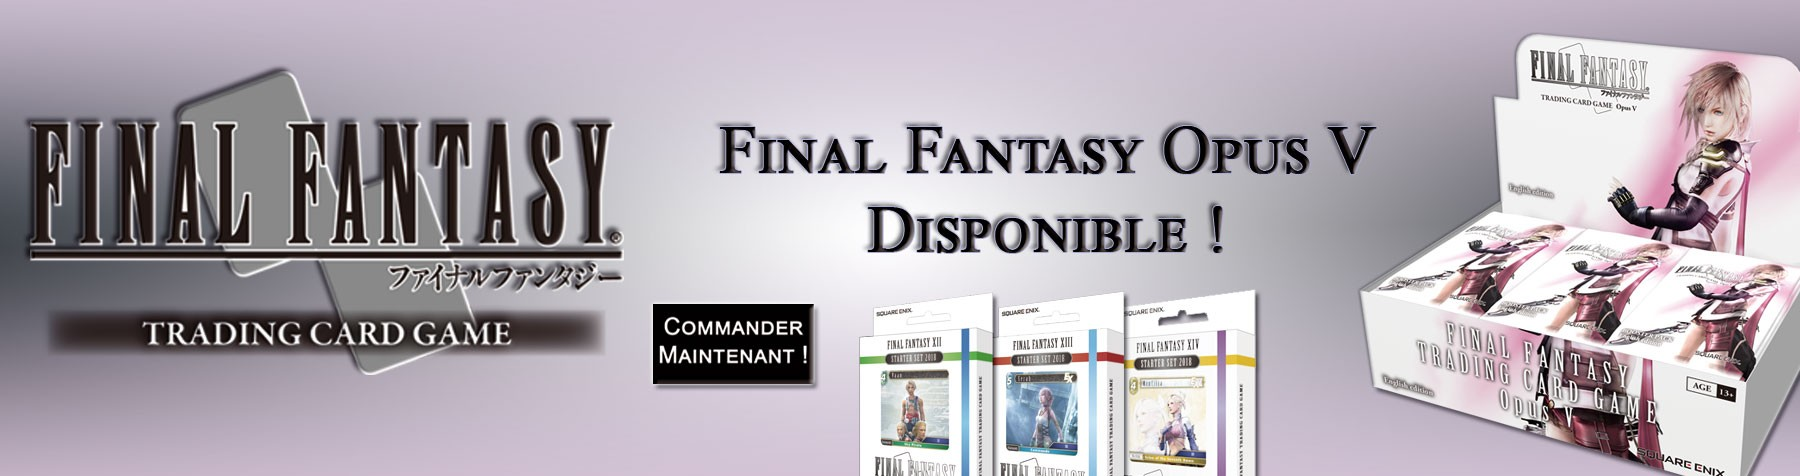 Final Fantasy Opus 5